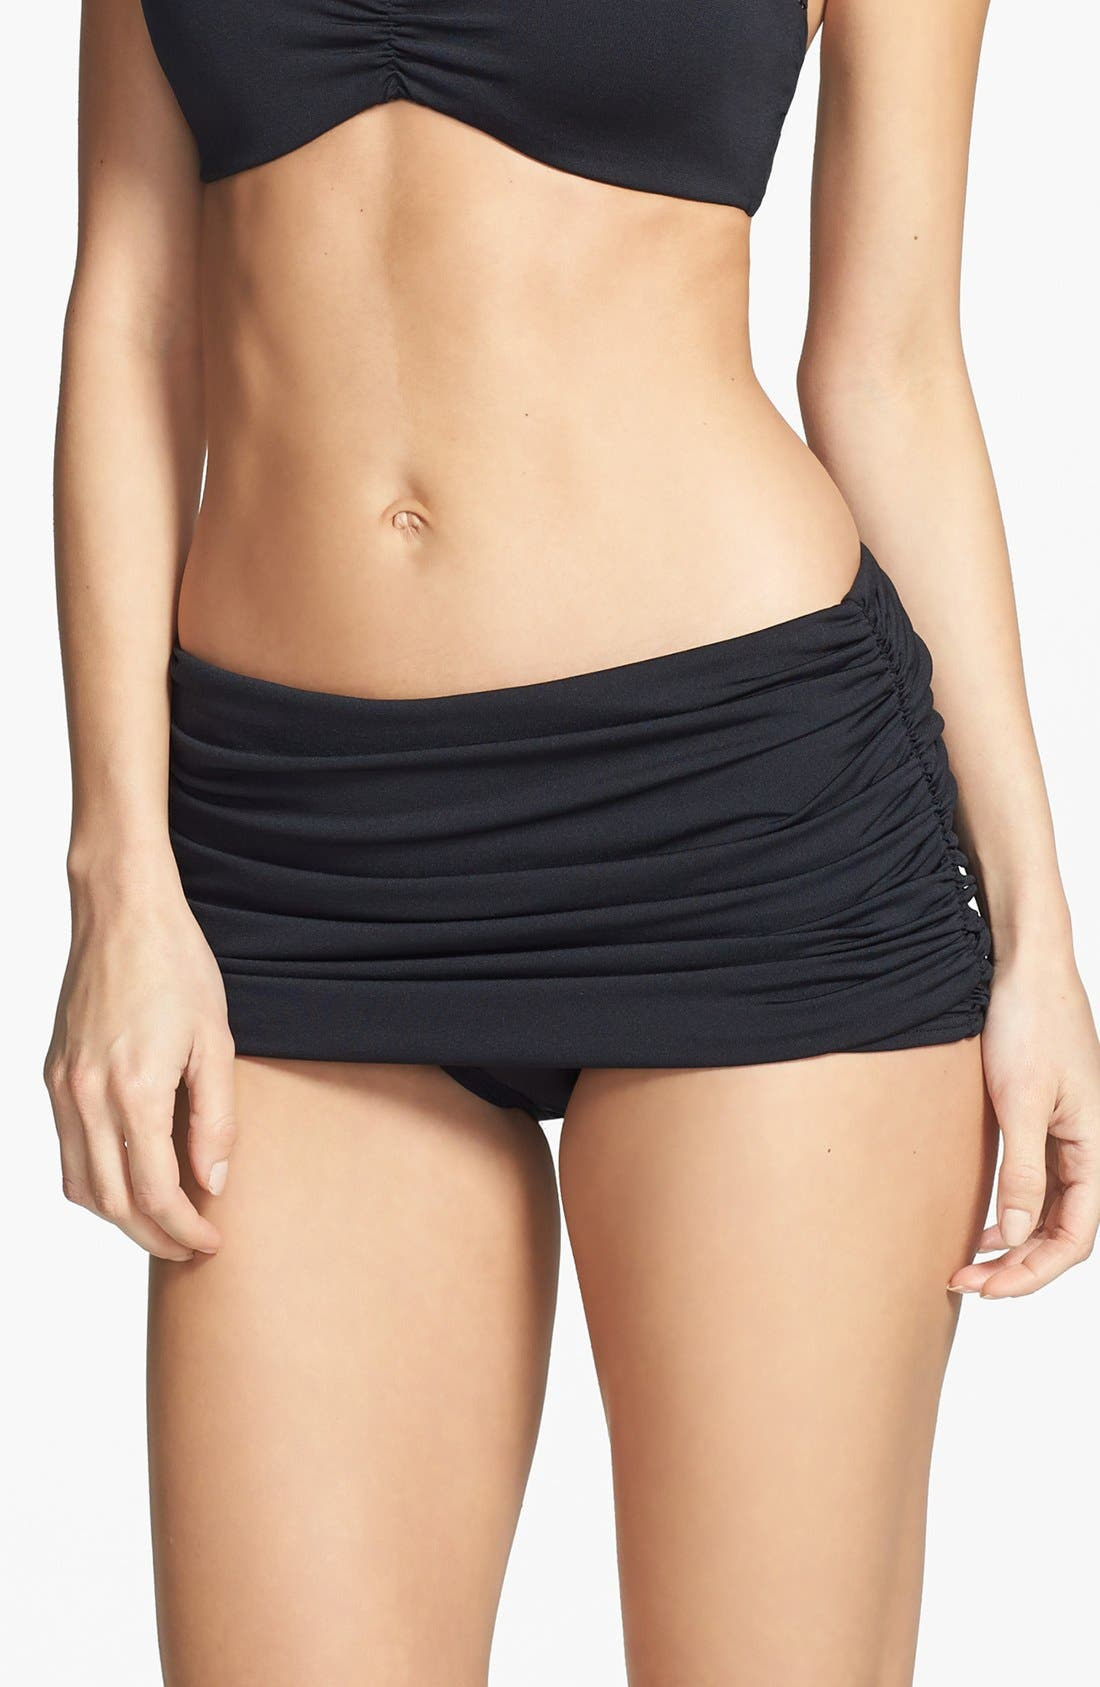 Carmen Marc Valvo 'Cape Town Beach' Shirred Skirted Bikini Bottoms,                         Main,                         color, Luxe Black